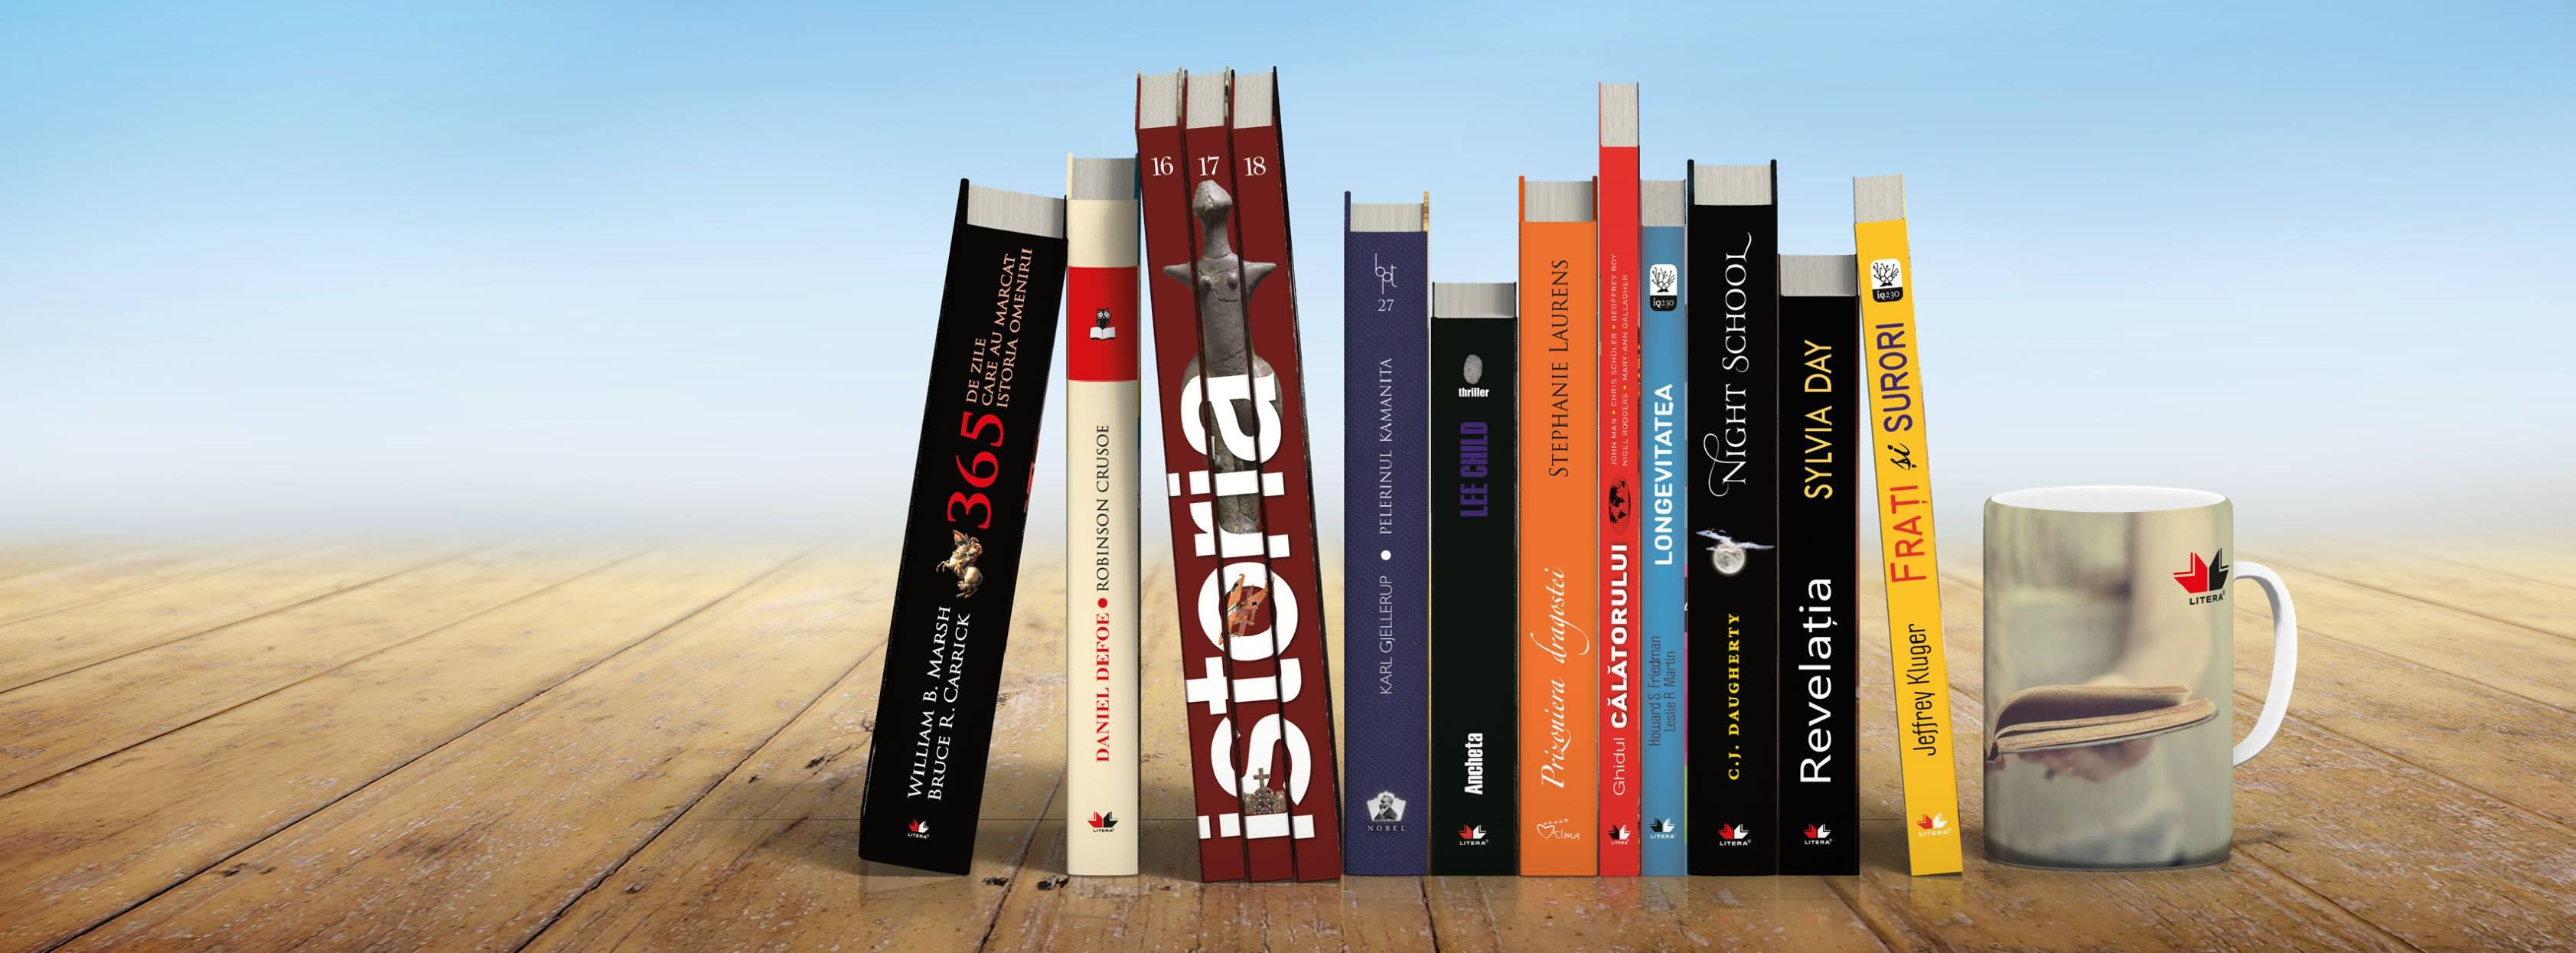 books carti